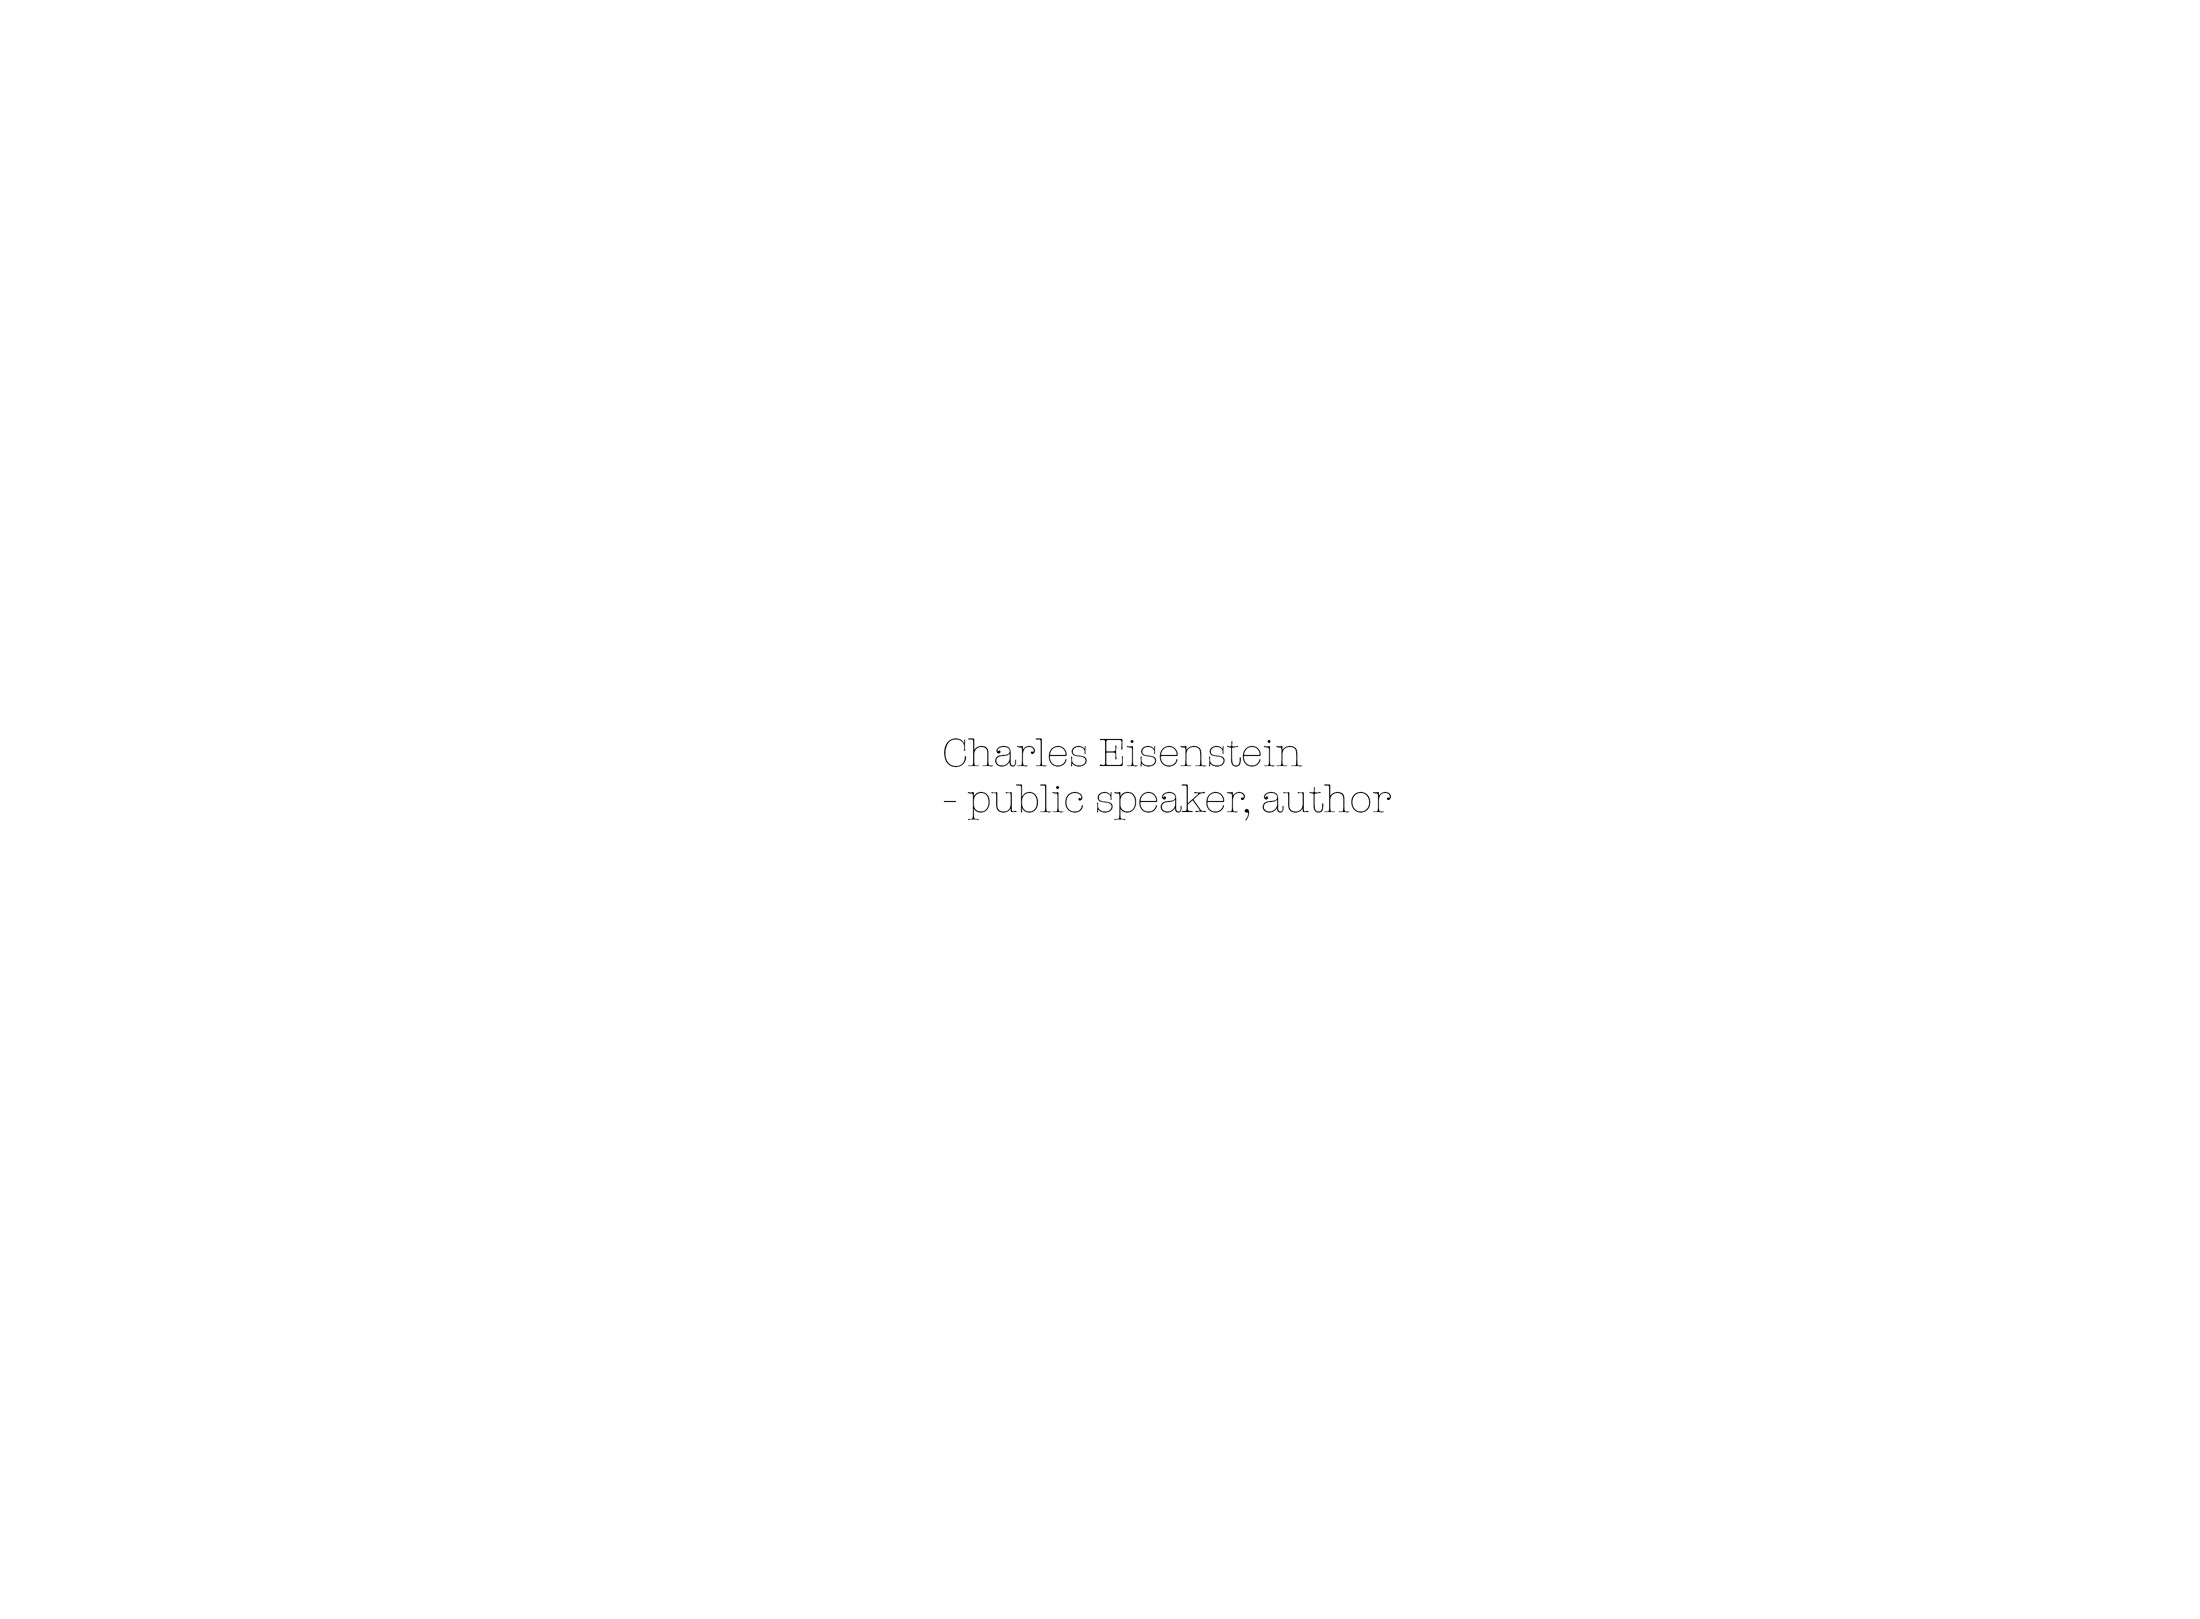 CharlesTy.jpg